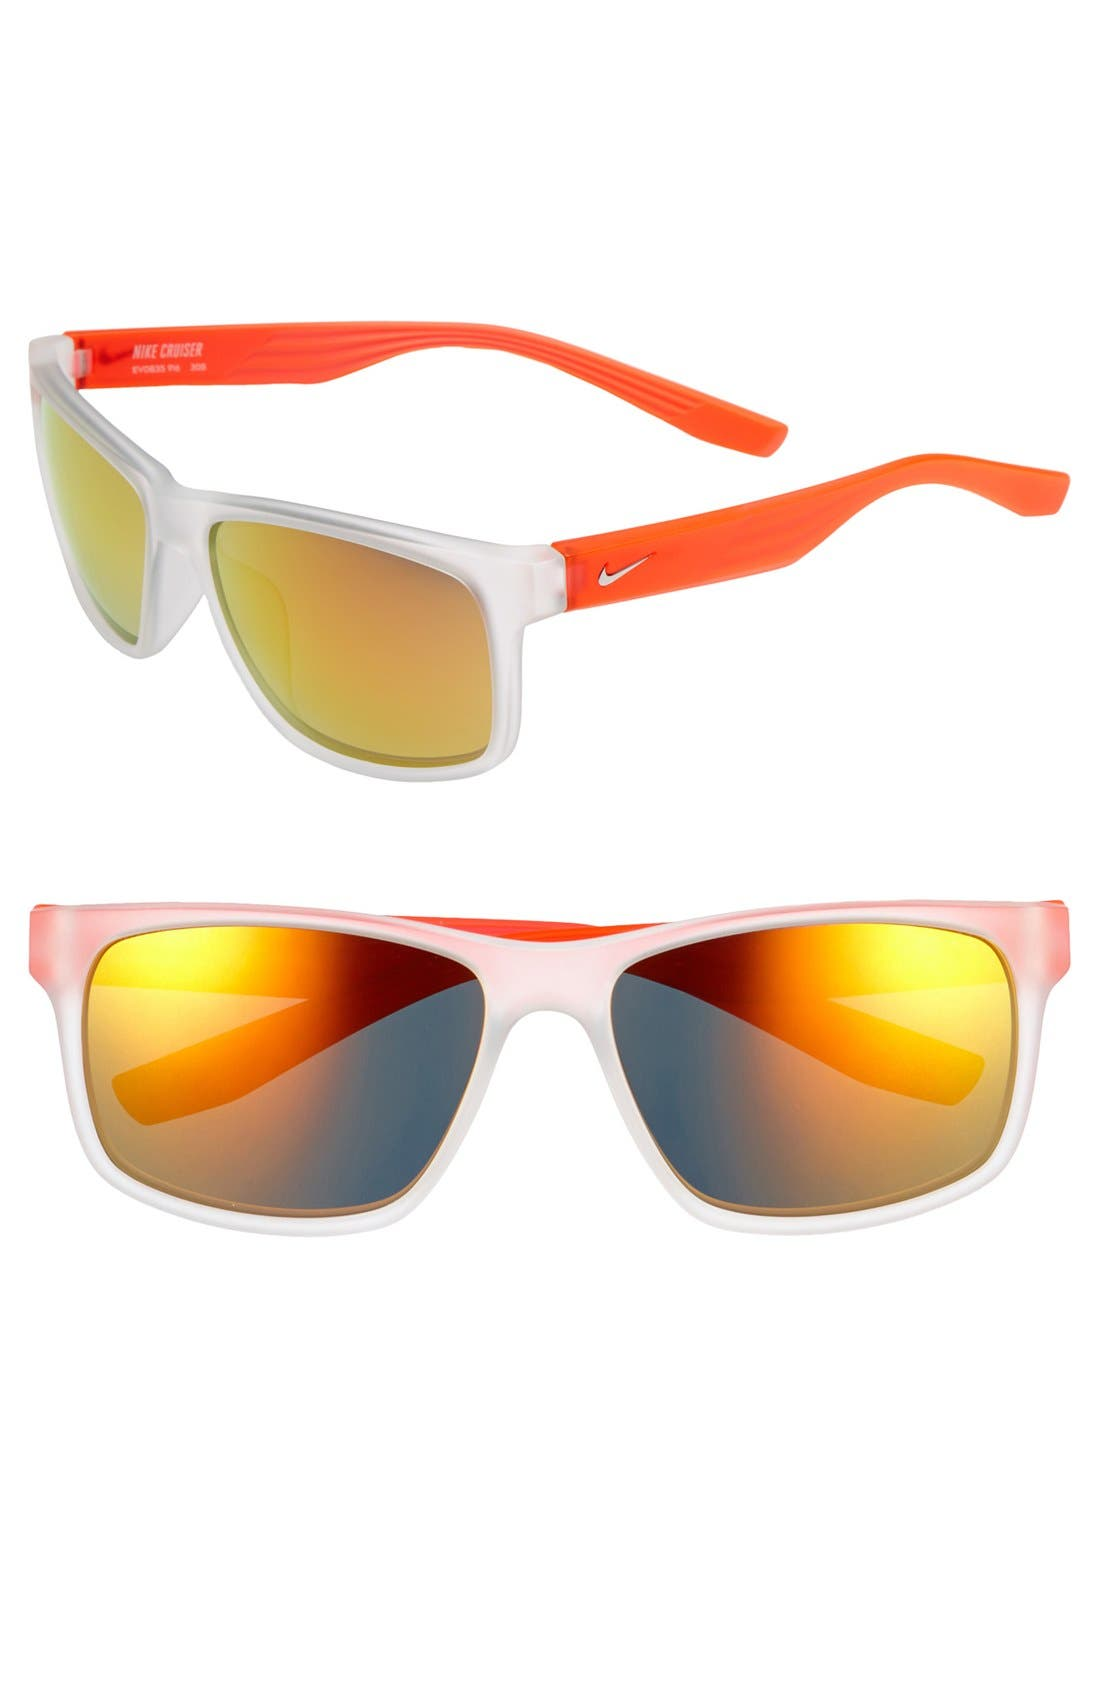 Alternate Image 1 Selected - Nike 'Cruiser' 59mm Sunglasses